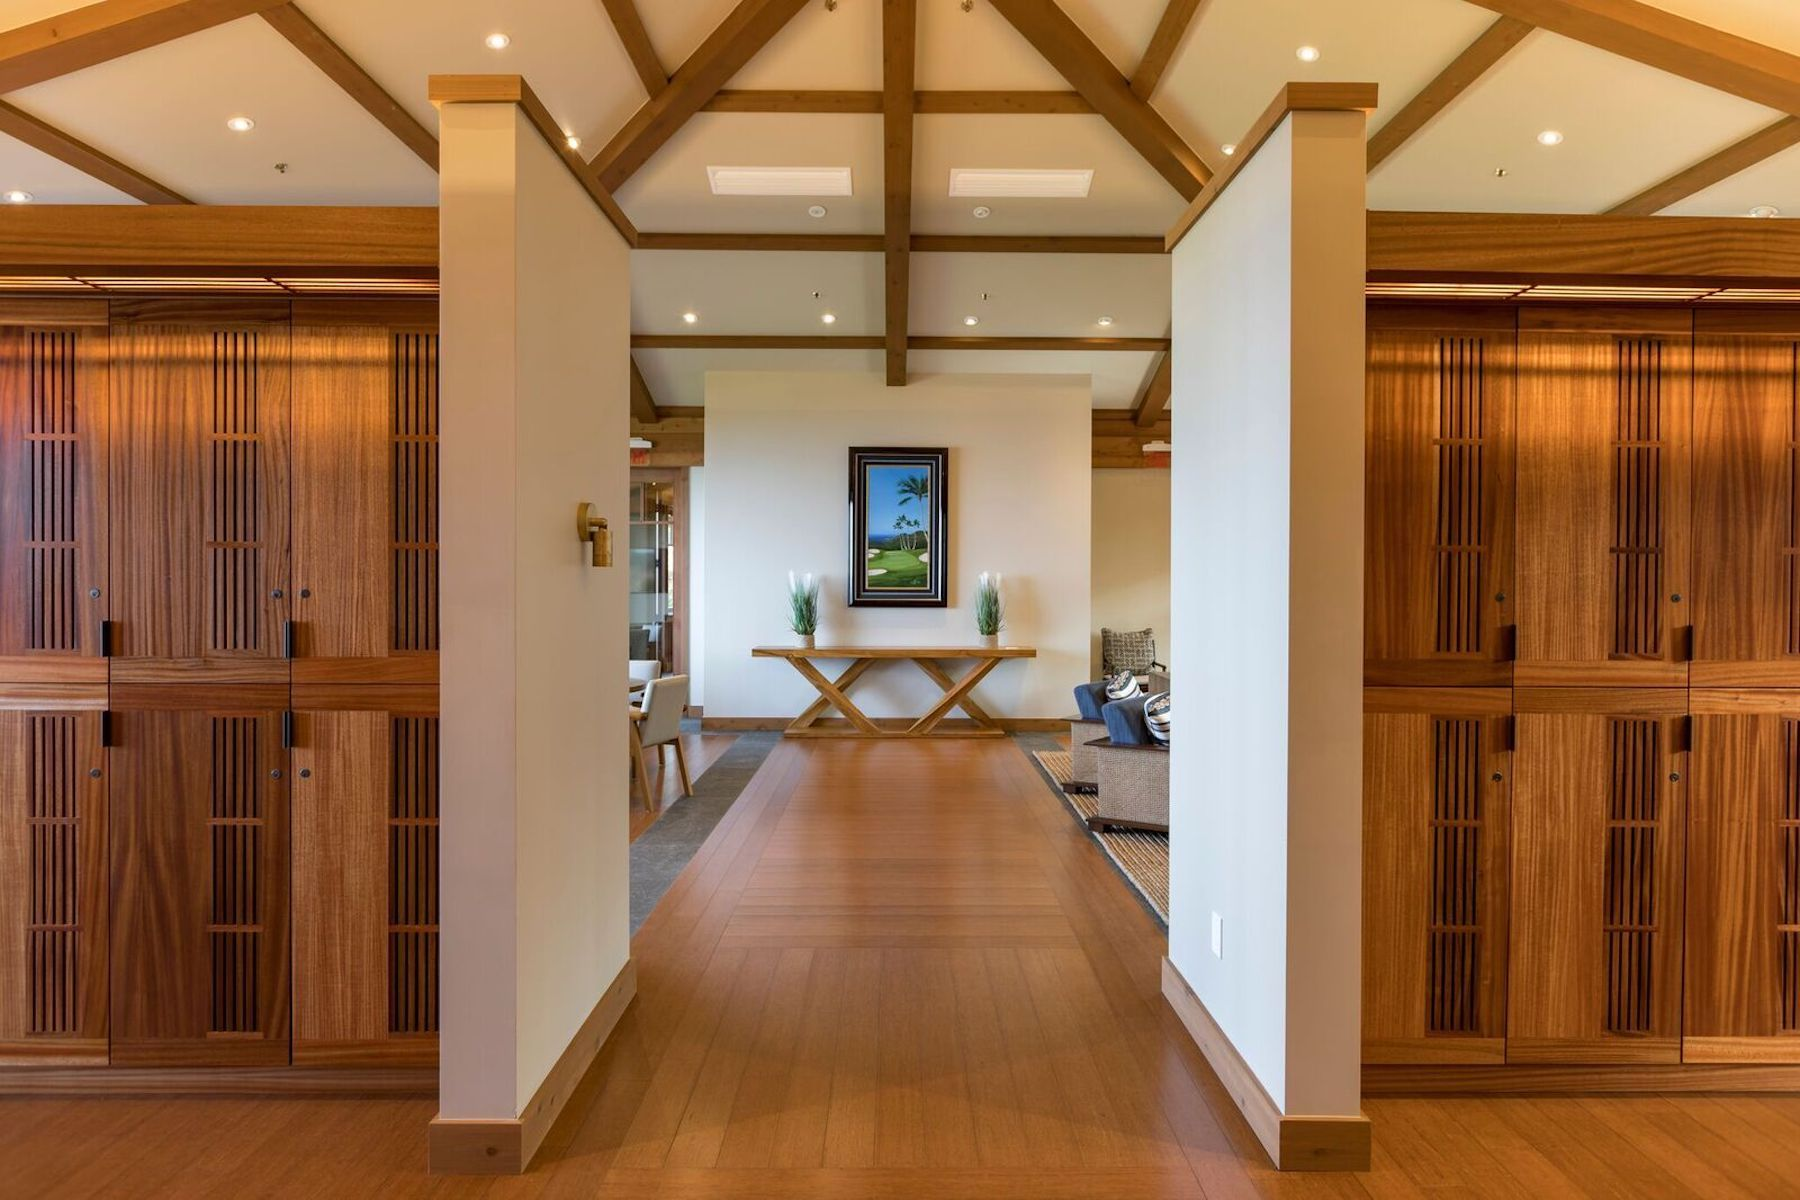 Land for Sale at Hokulia 81-453 Holoai Way Kealakekua, Hawaii 96750 United States